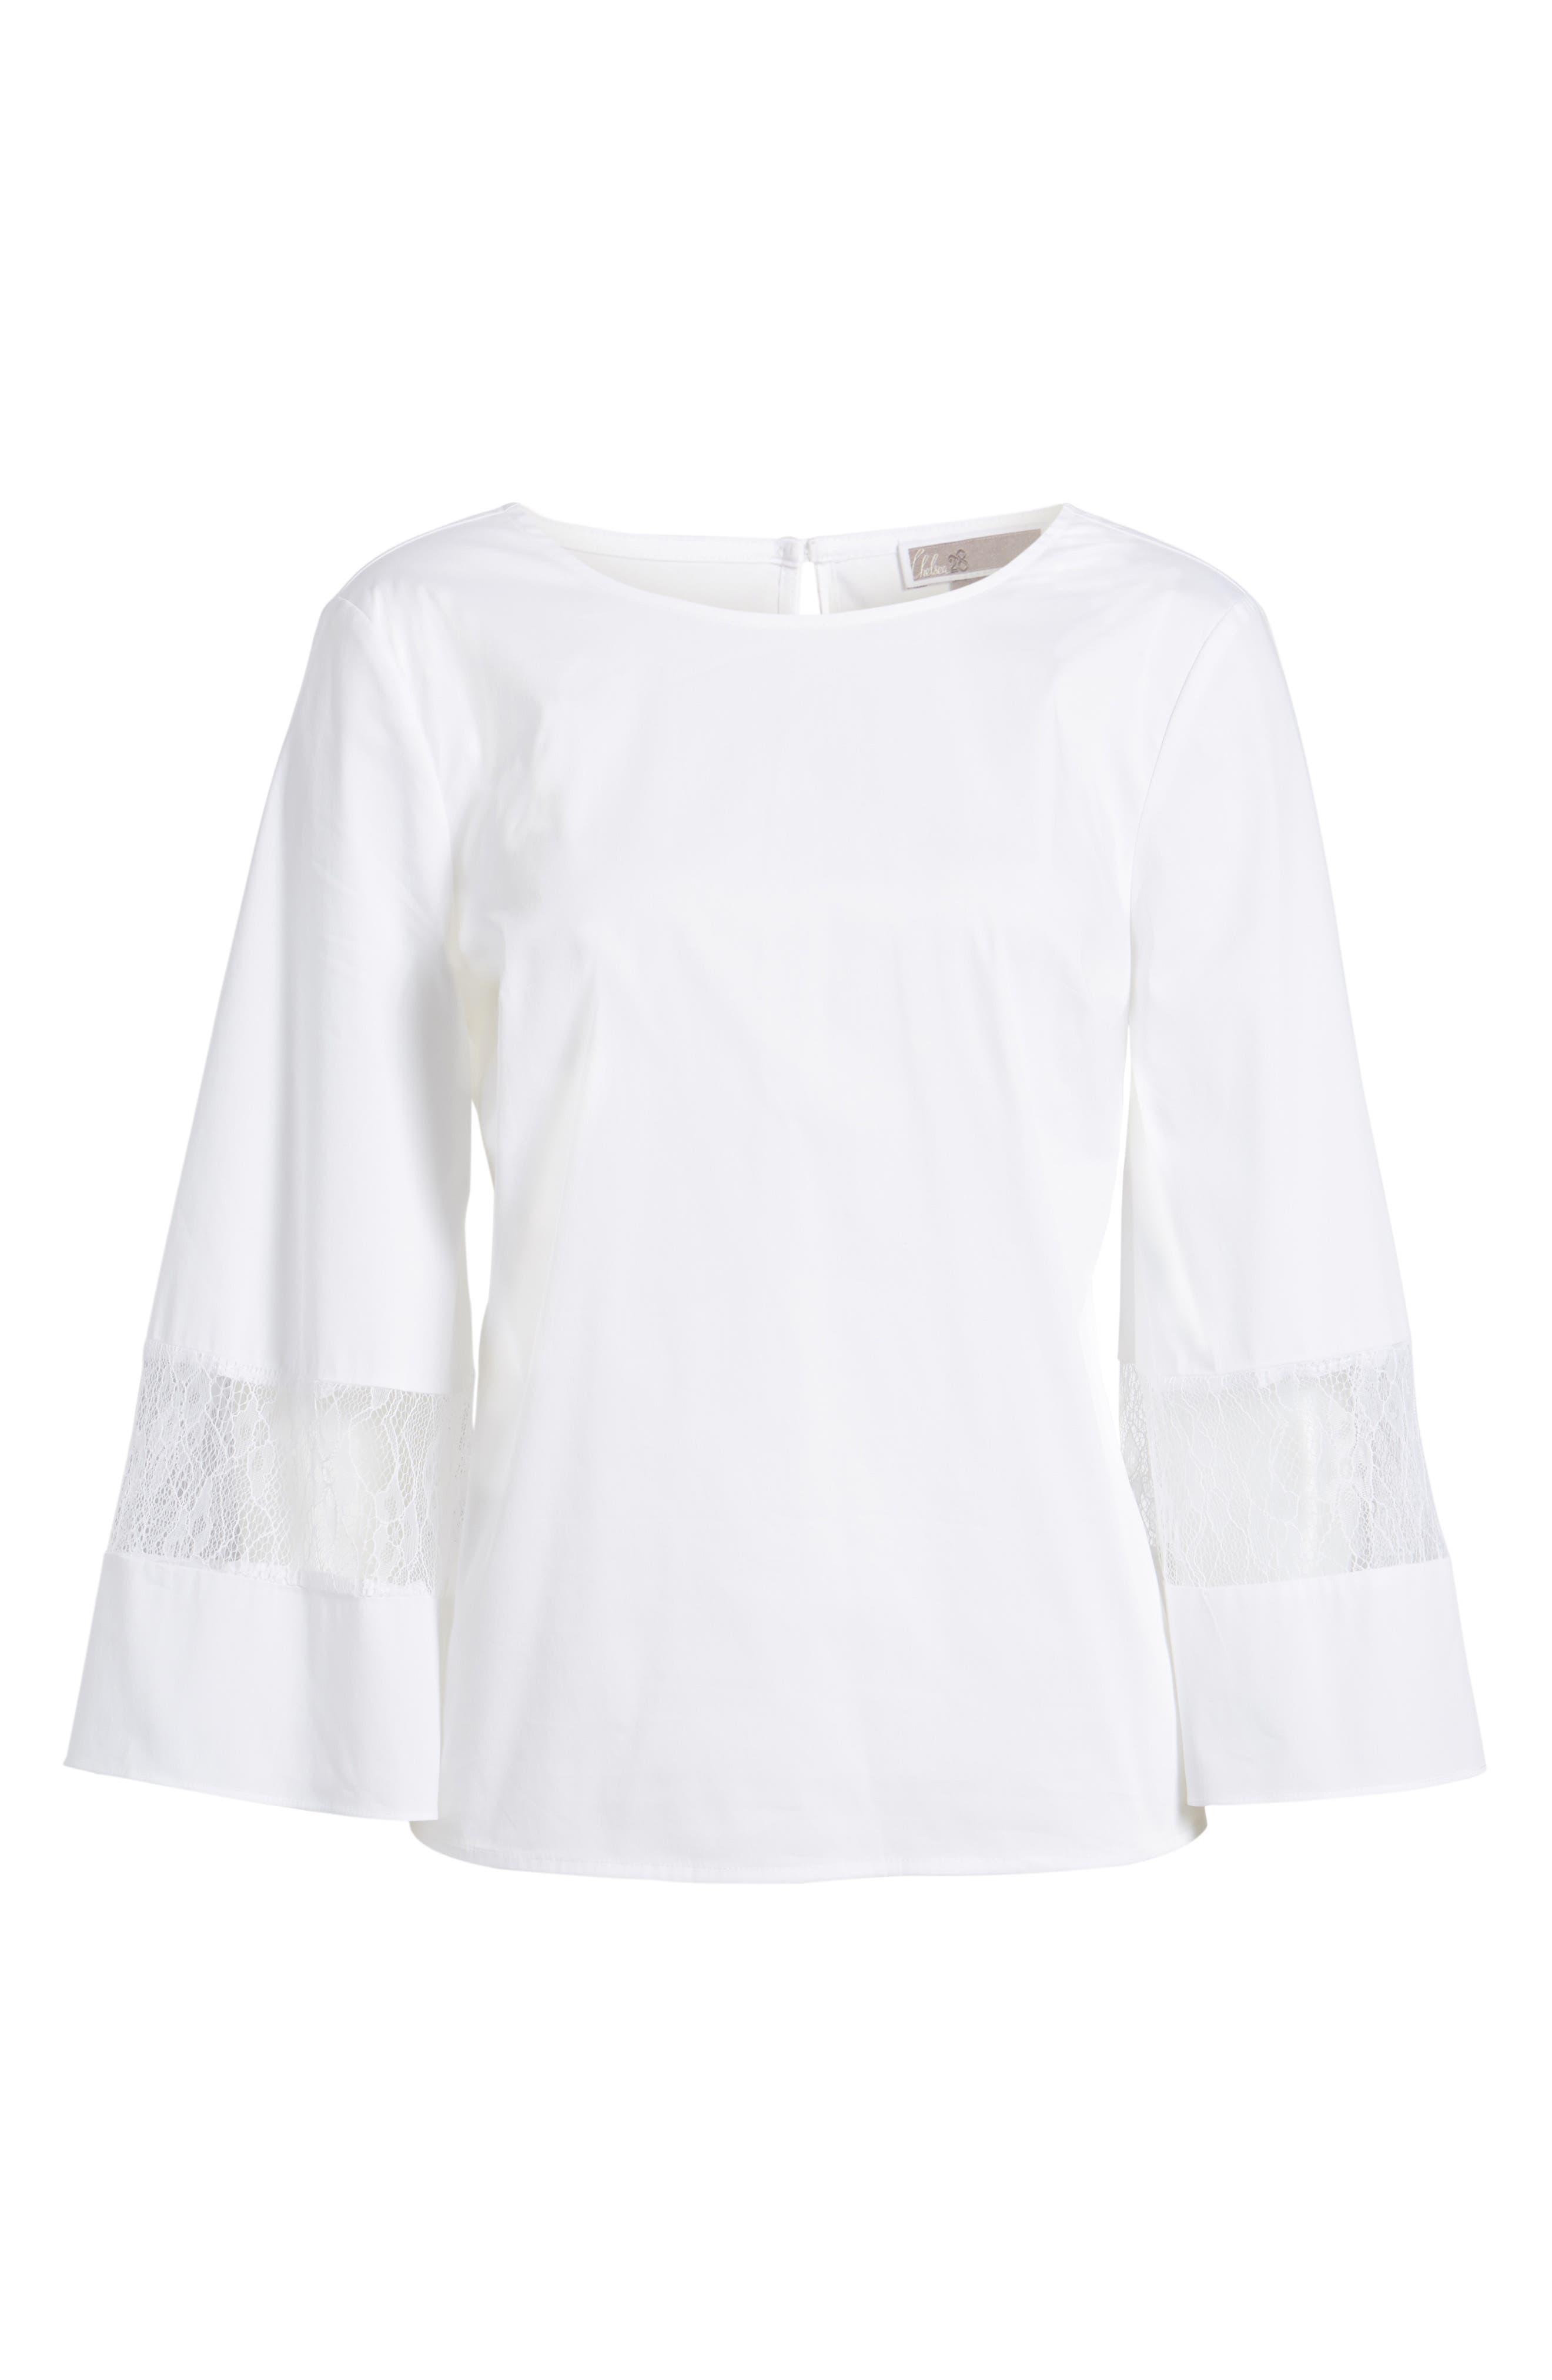 Lace & Poplin Blouse,                             Alternate thumbnail 6, color,                             White